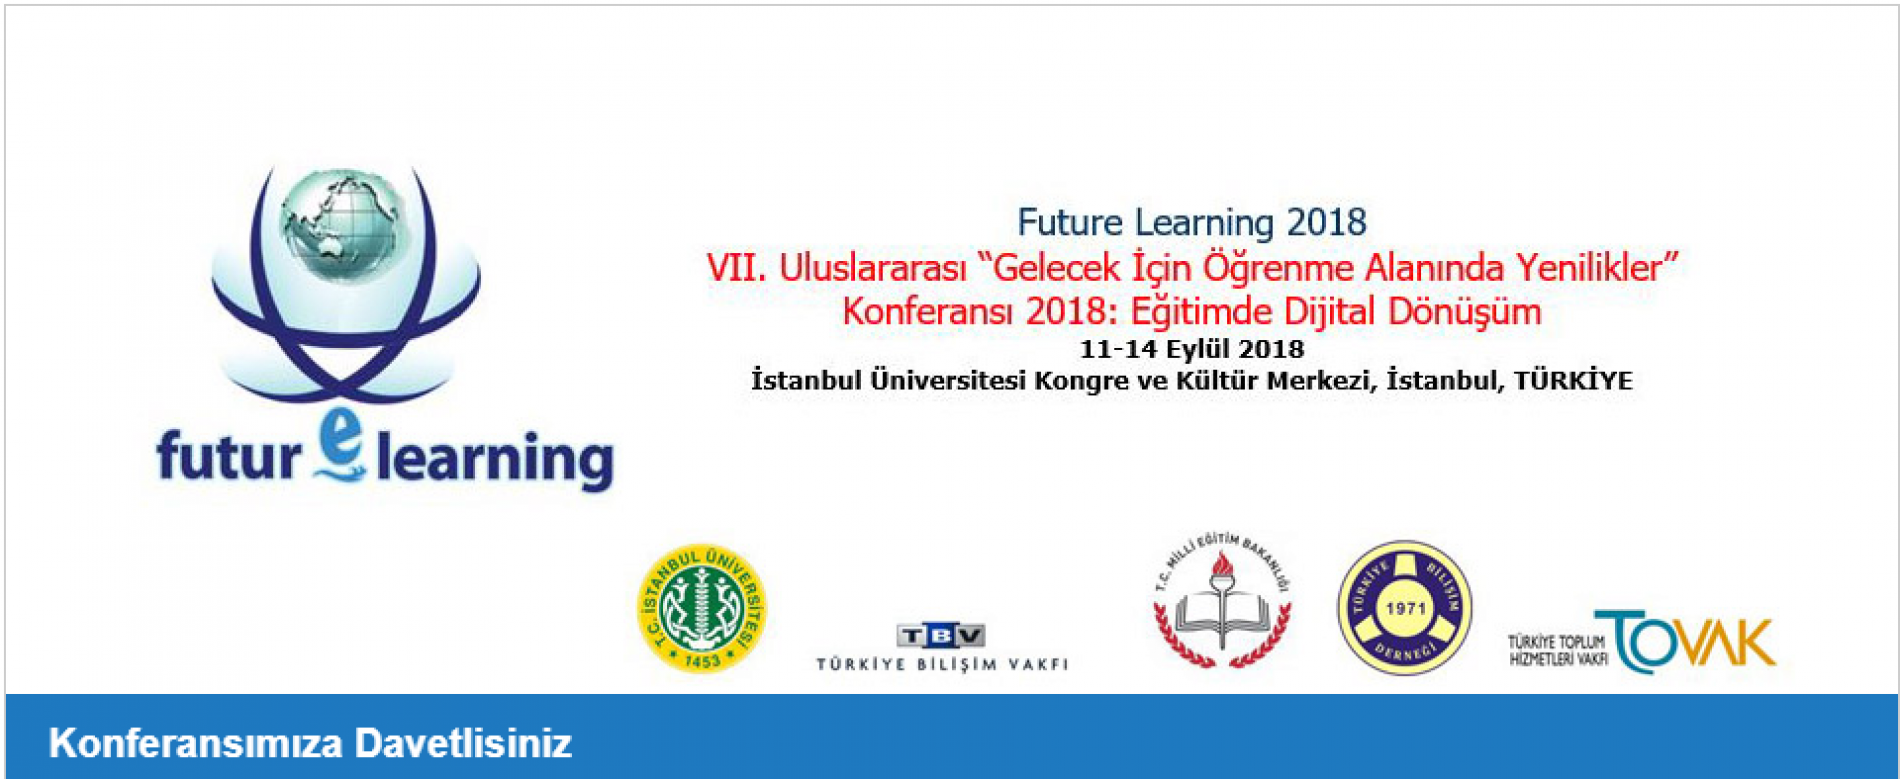 FUTURE LEARNING 2018 KONFERANSI